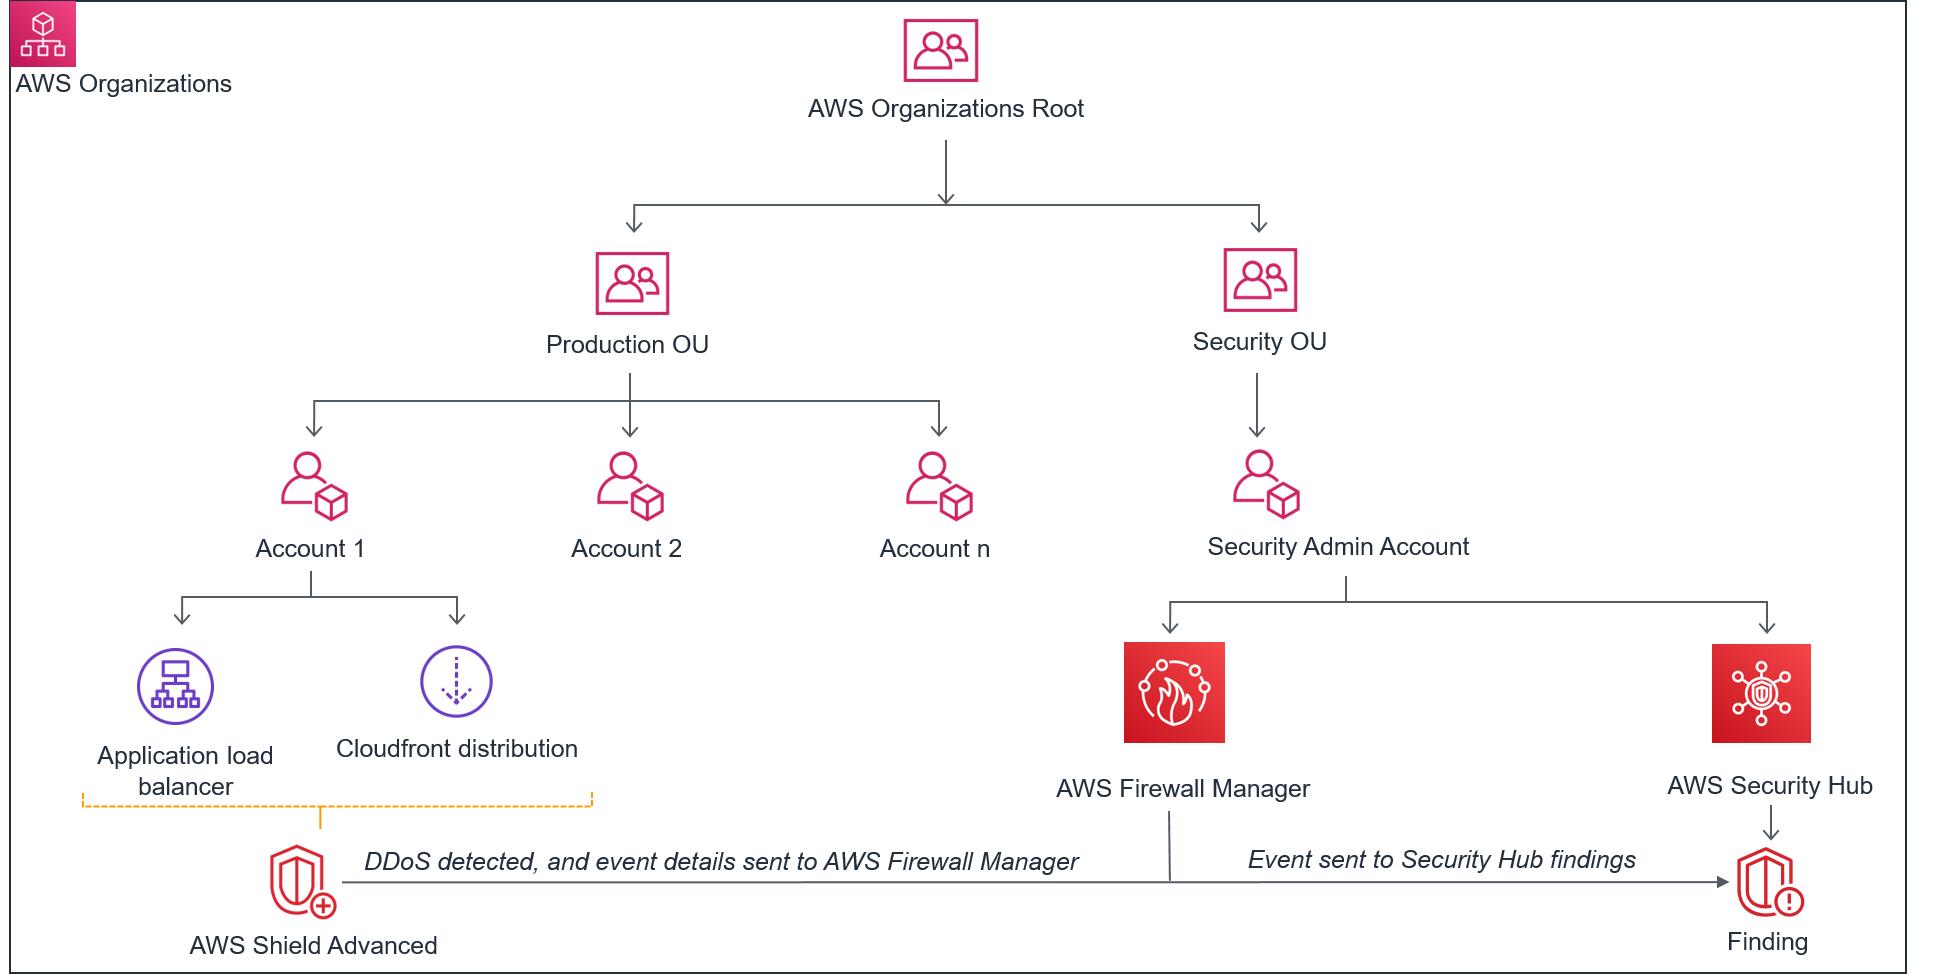 Figure 1: Scenario 1 – Shield Advanced DDoS detected events visible in Security Hub